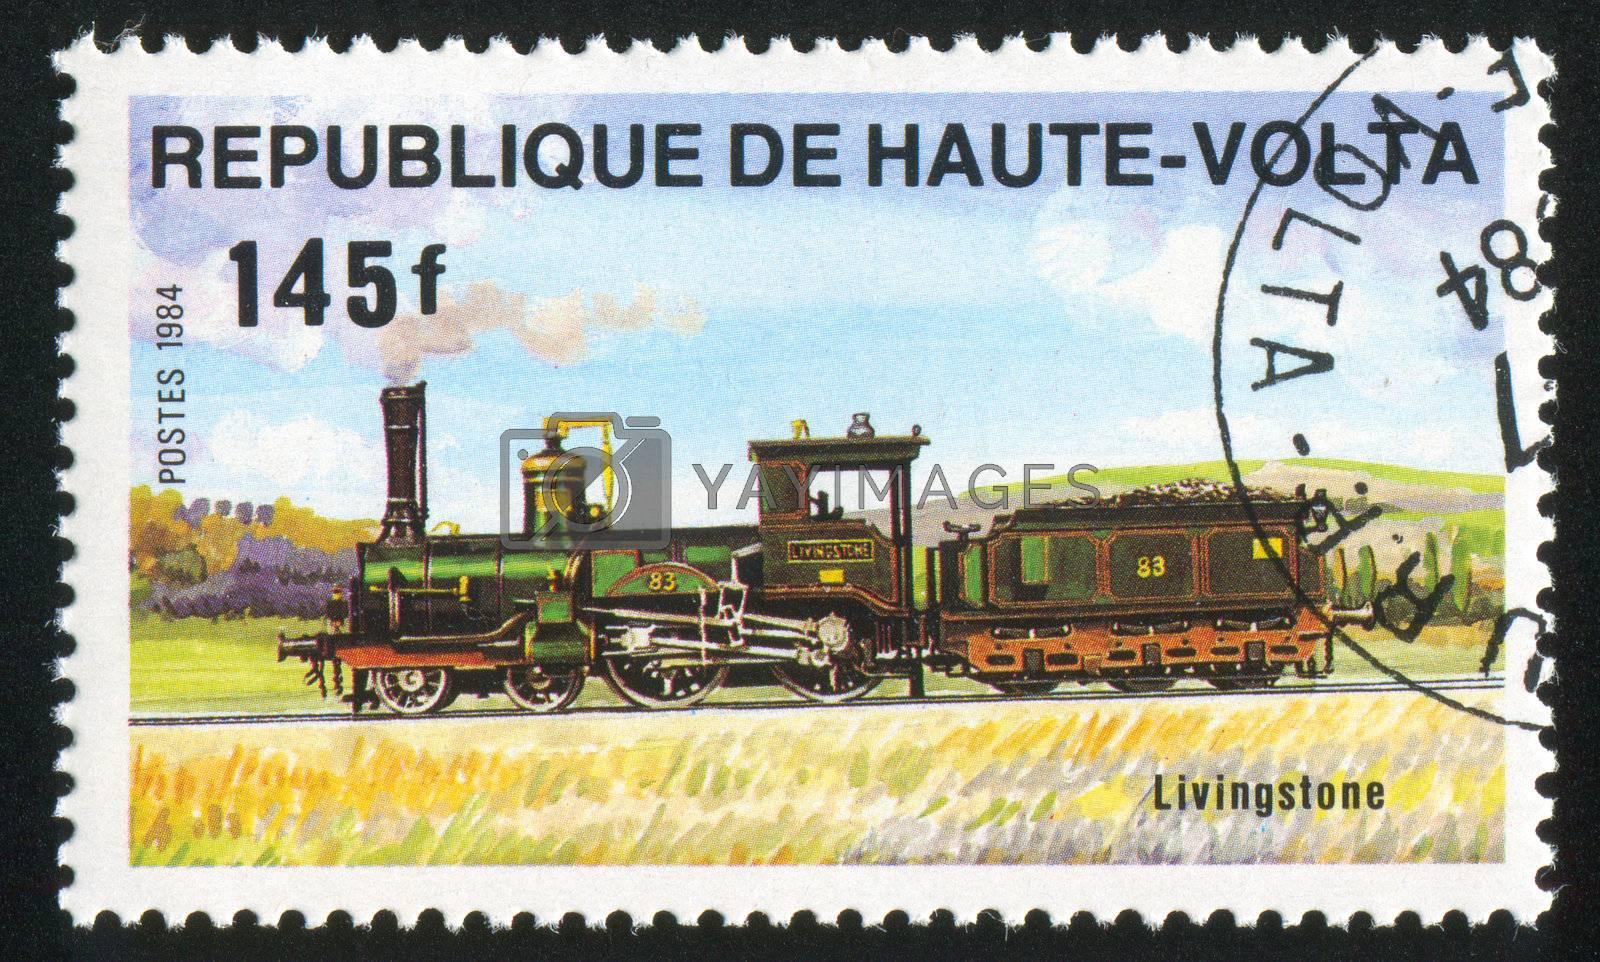 BURKINA FASO - CIRCA 1984: stamp printed by Burkina Faso, shows locomotive, circa 1984.